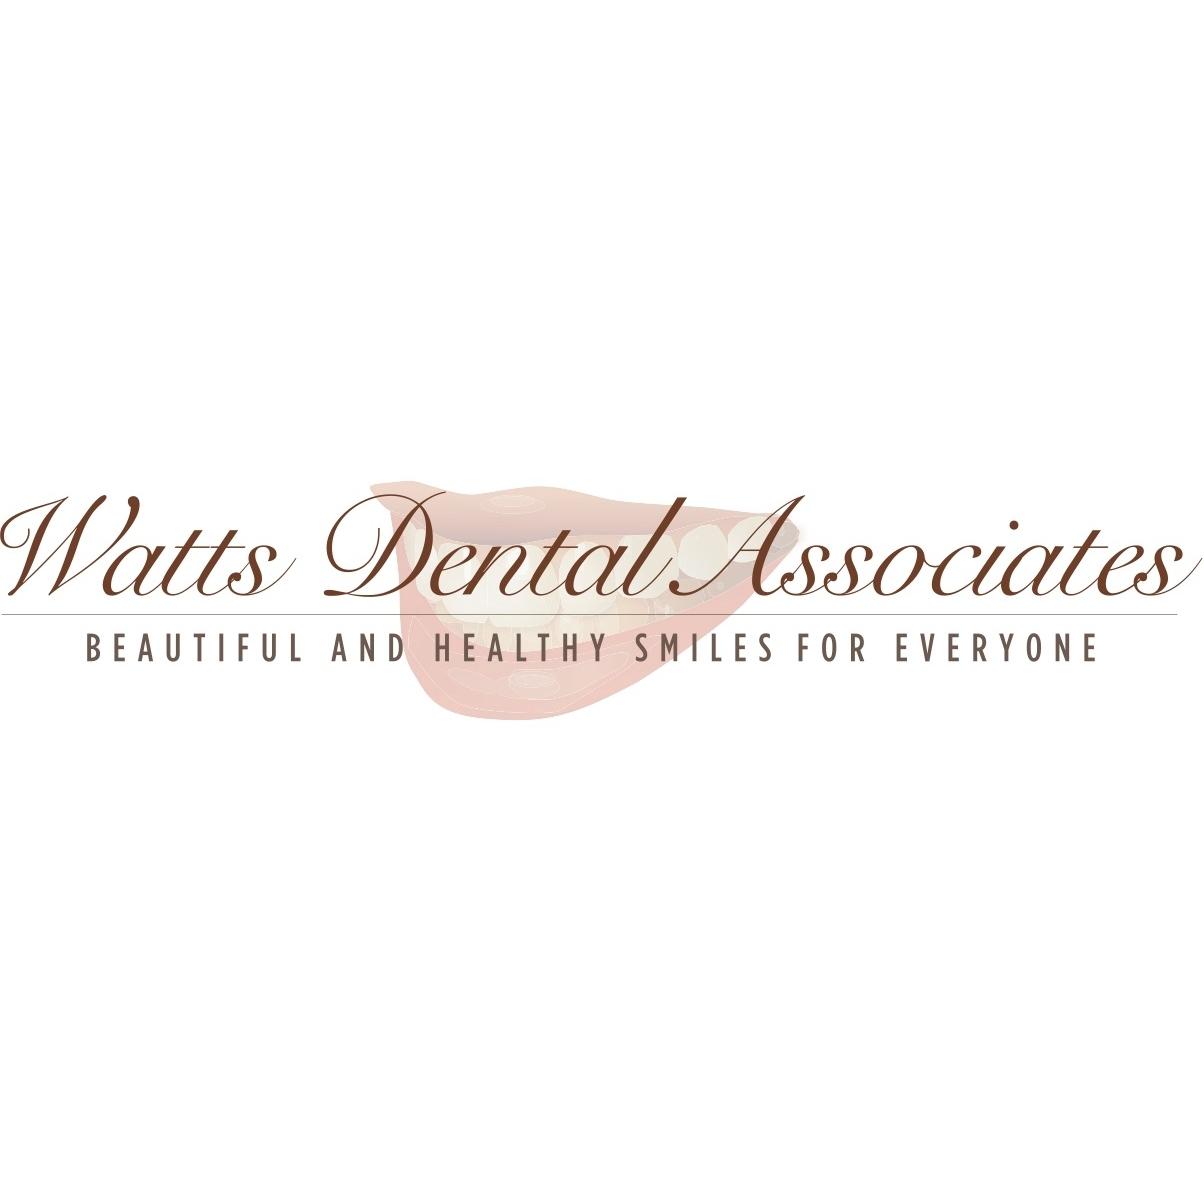 Watts Dental Associates, P.C. - Upper Malboro, MD - Dentists & Dental Services